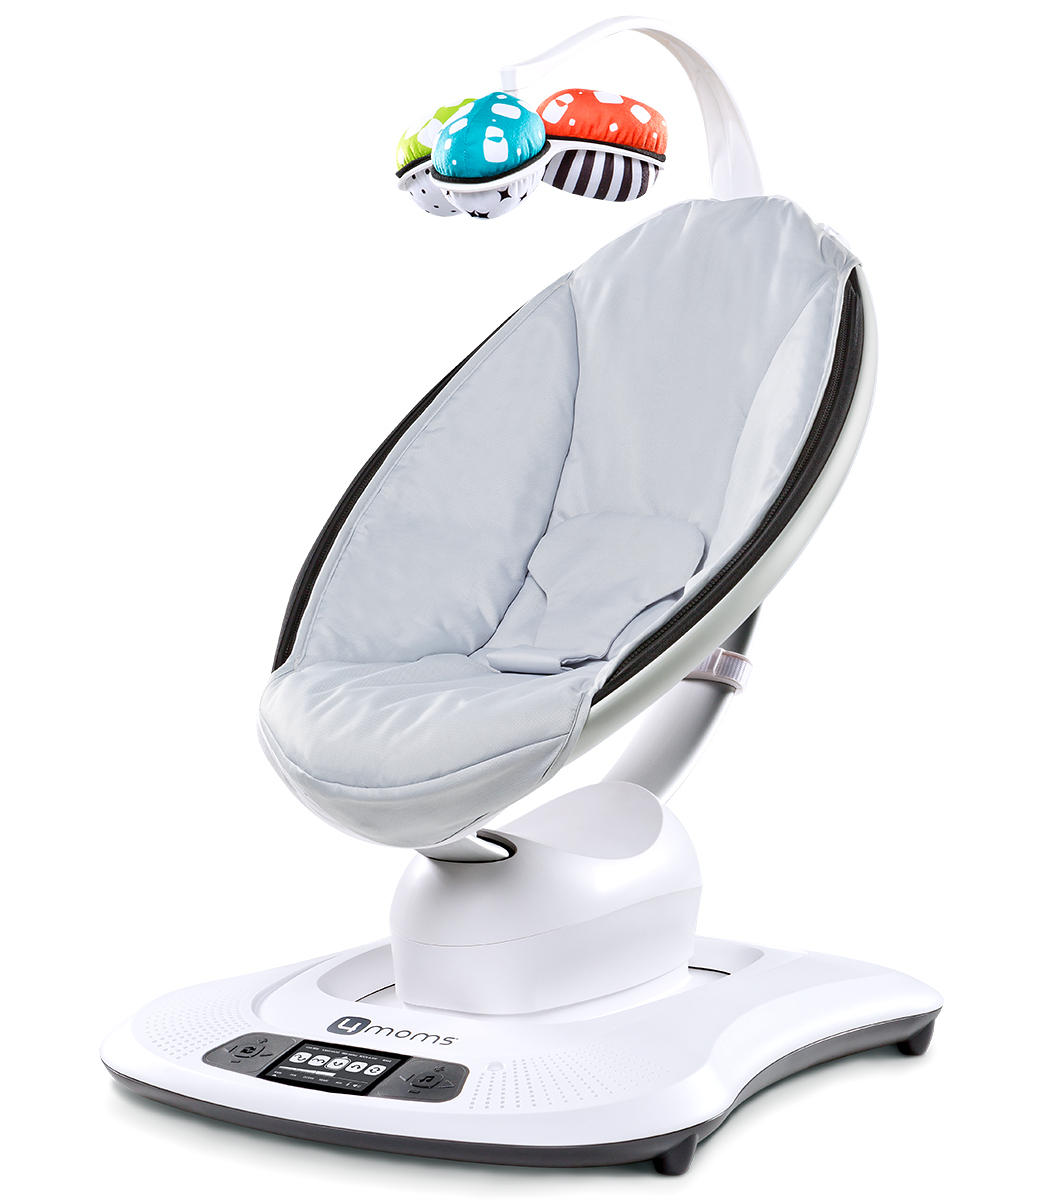 Кресло-качалка 4MOMS MAMAROO 3.0 СЕРЕБРИСТЫЙ